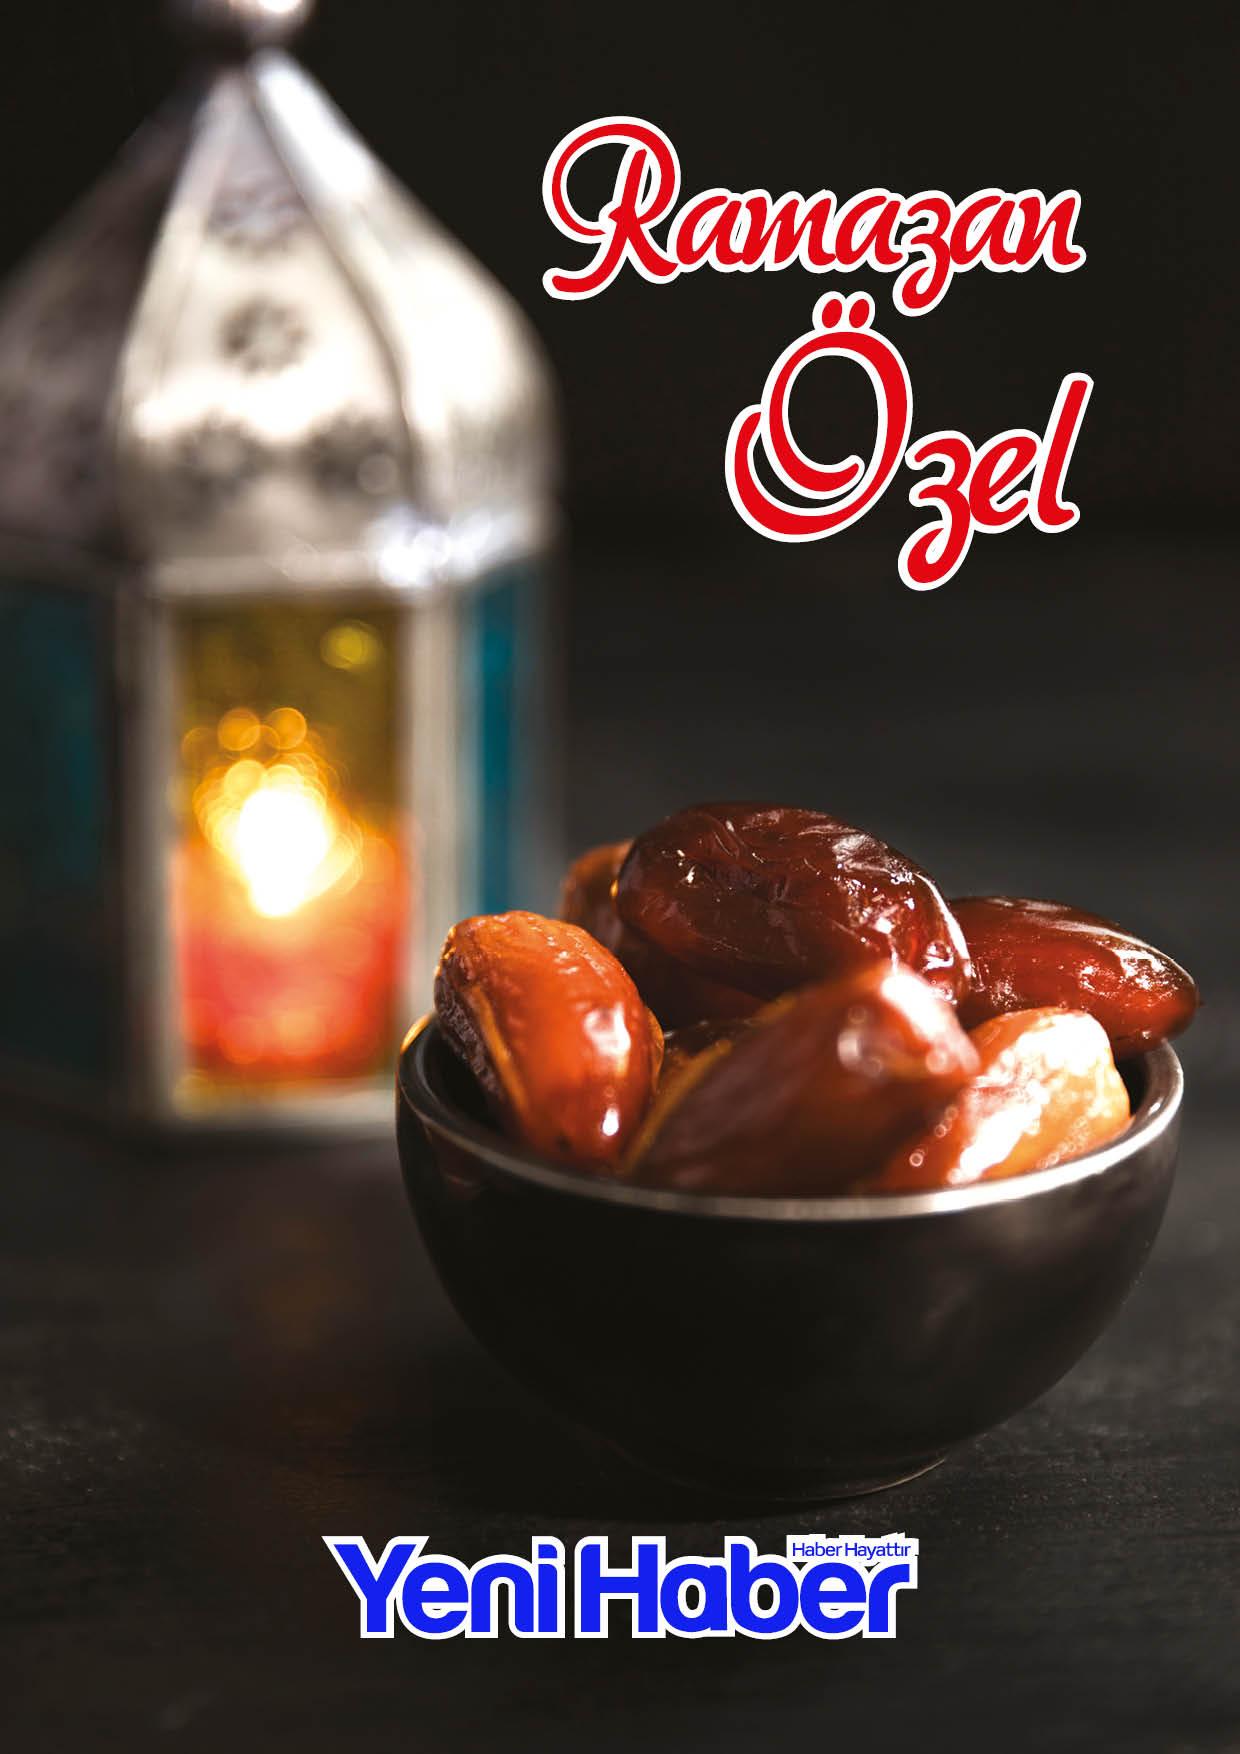 ramazan-kapak-1.jpg